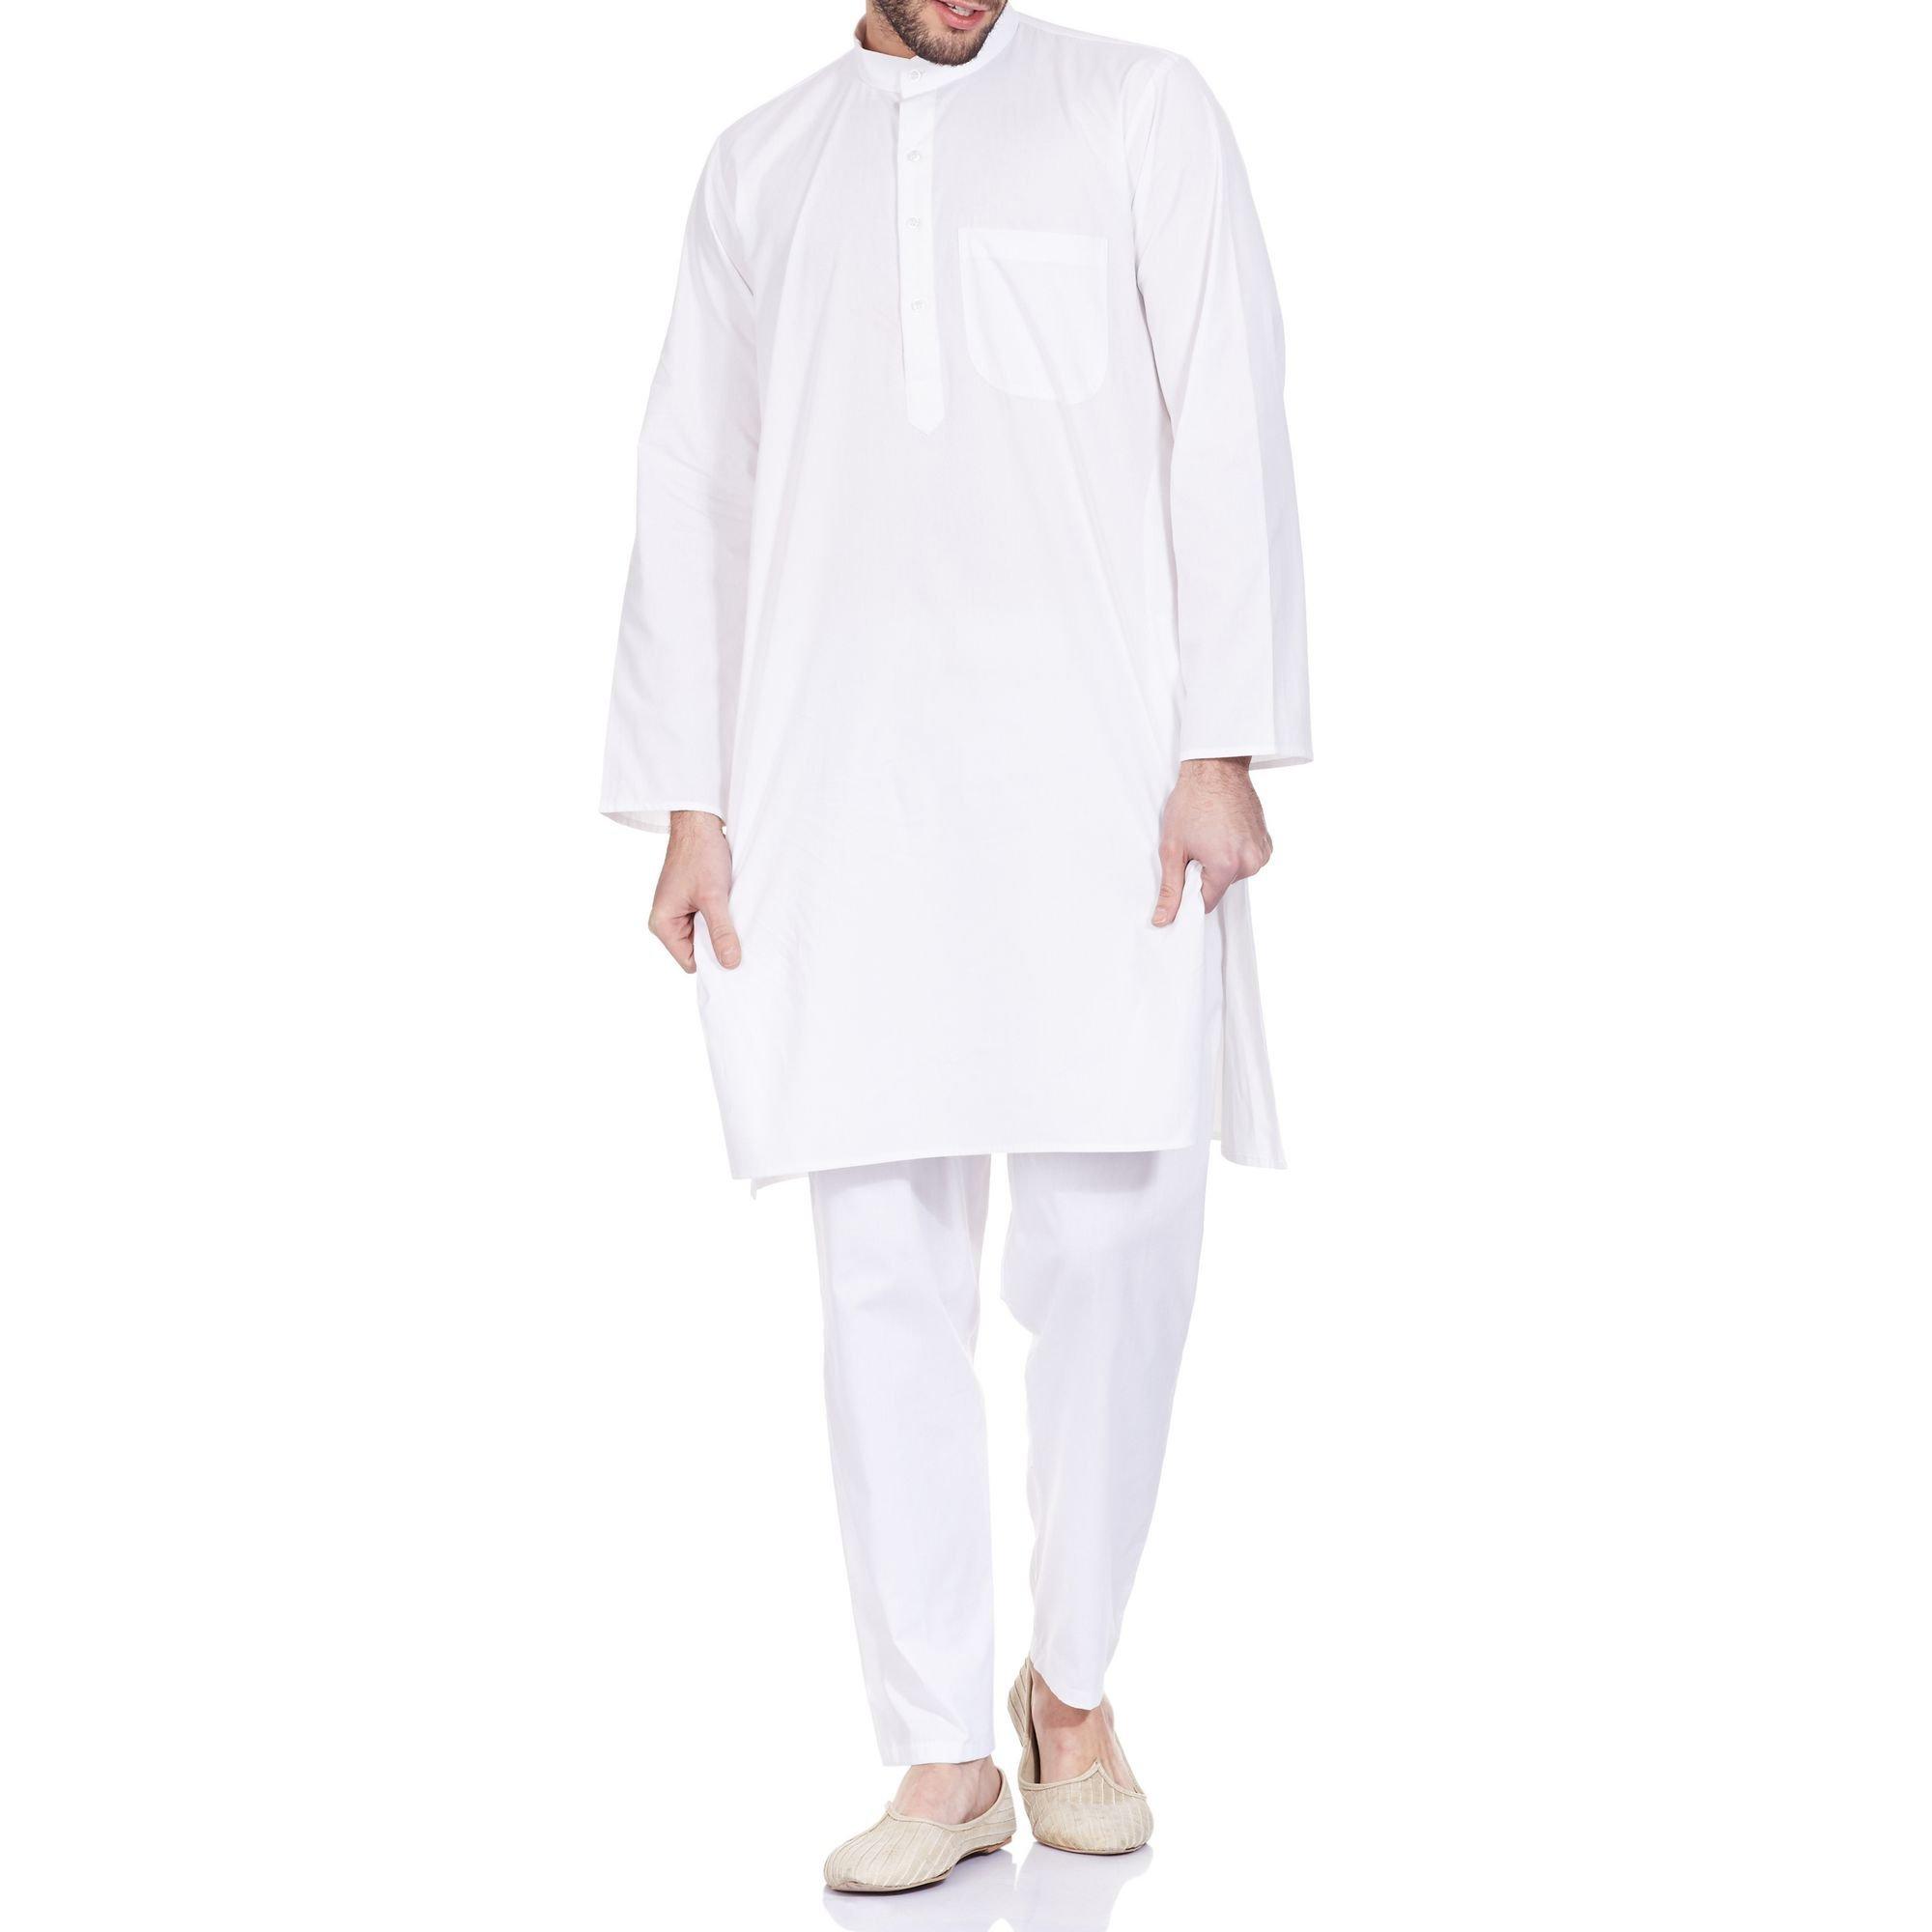 White Cotton Men's Kurta Pajamas Set - Traditional Costume -Casual Summer Dress